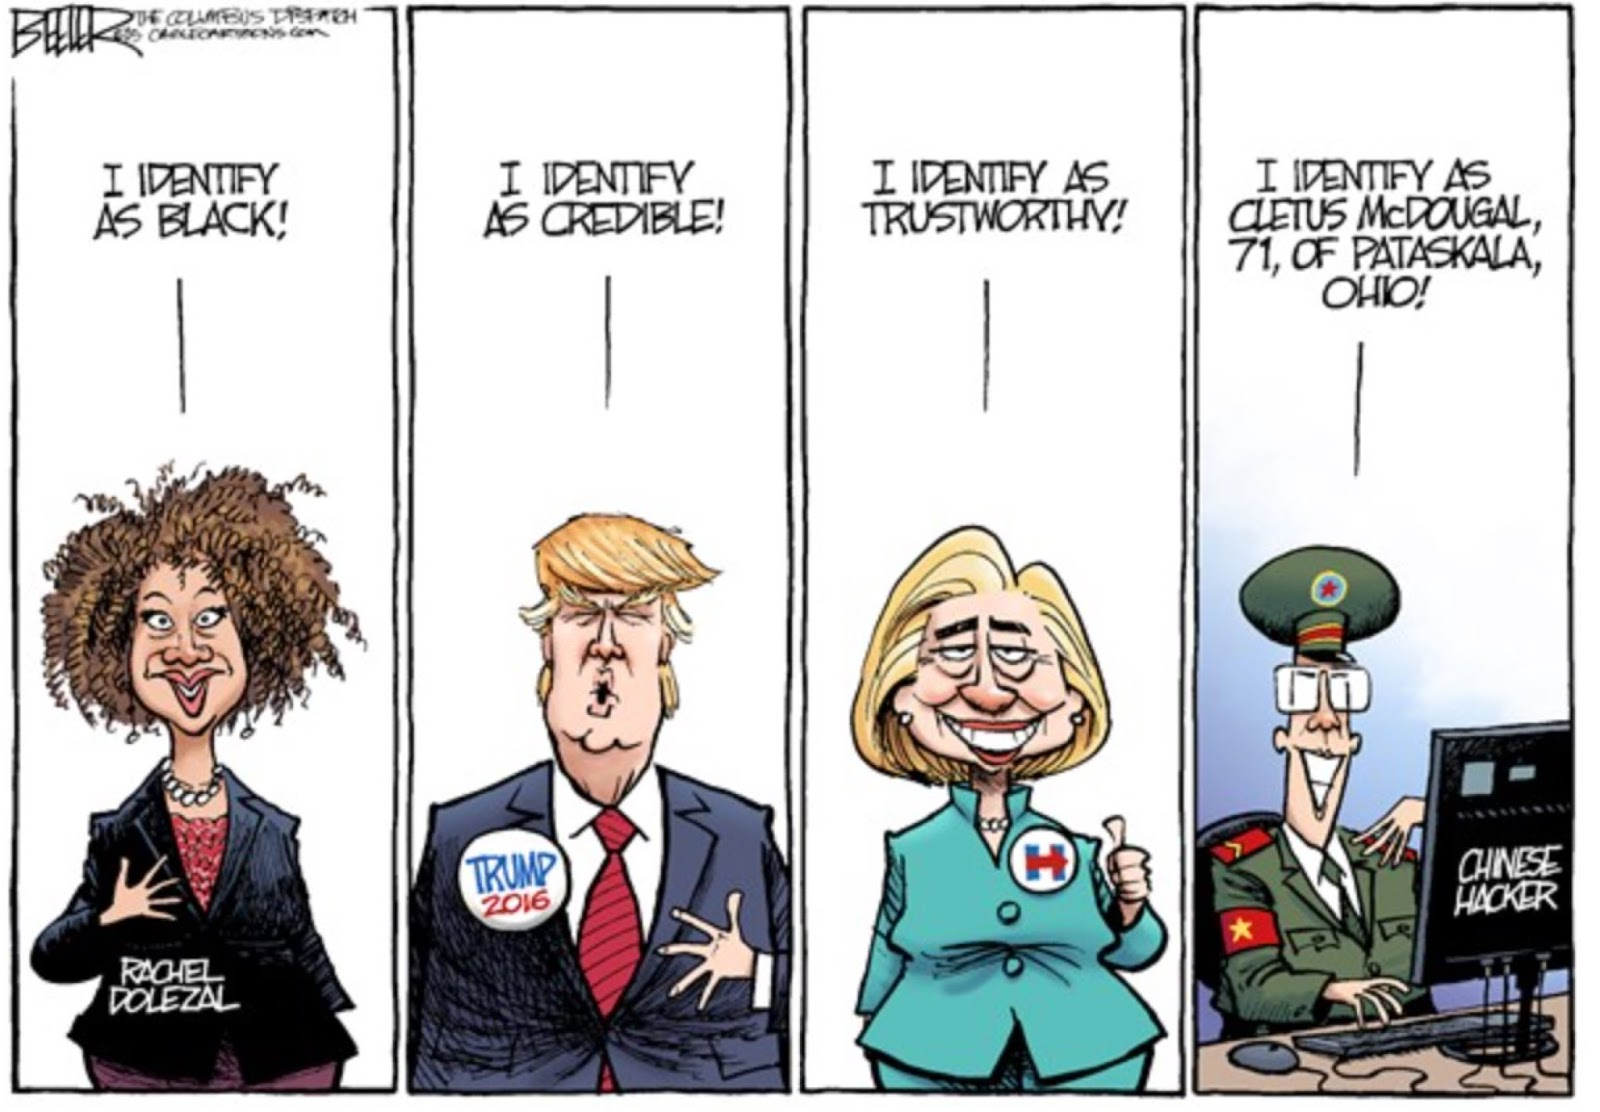 the american identity